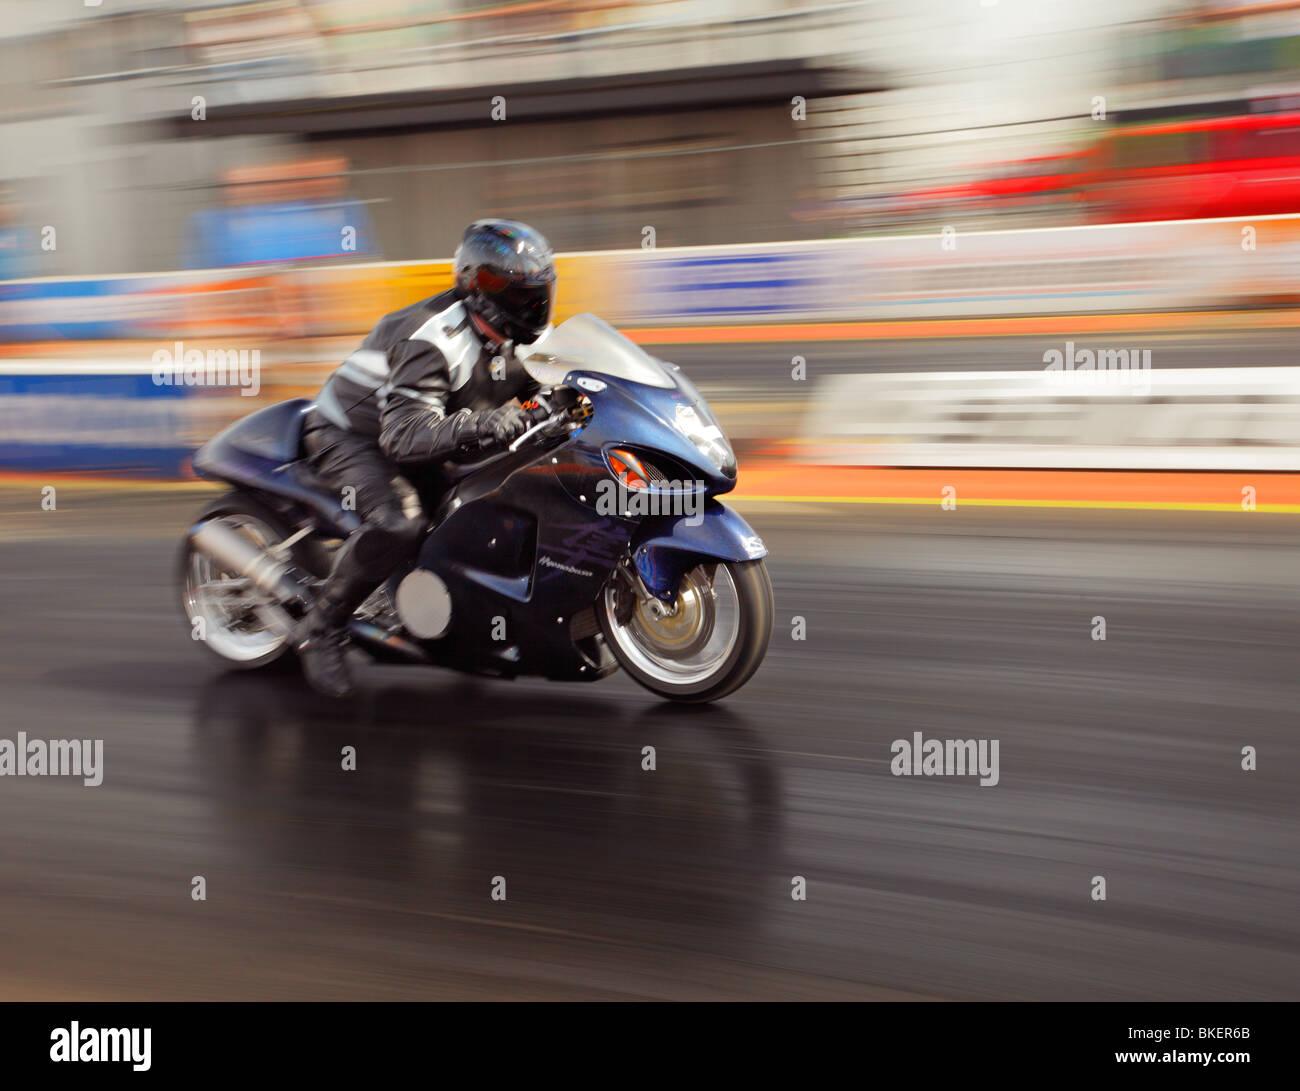 Suzuki Hayabusa Motorcycle in action at Santa pod. Stock Photo